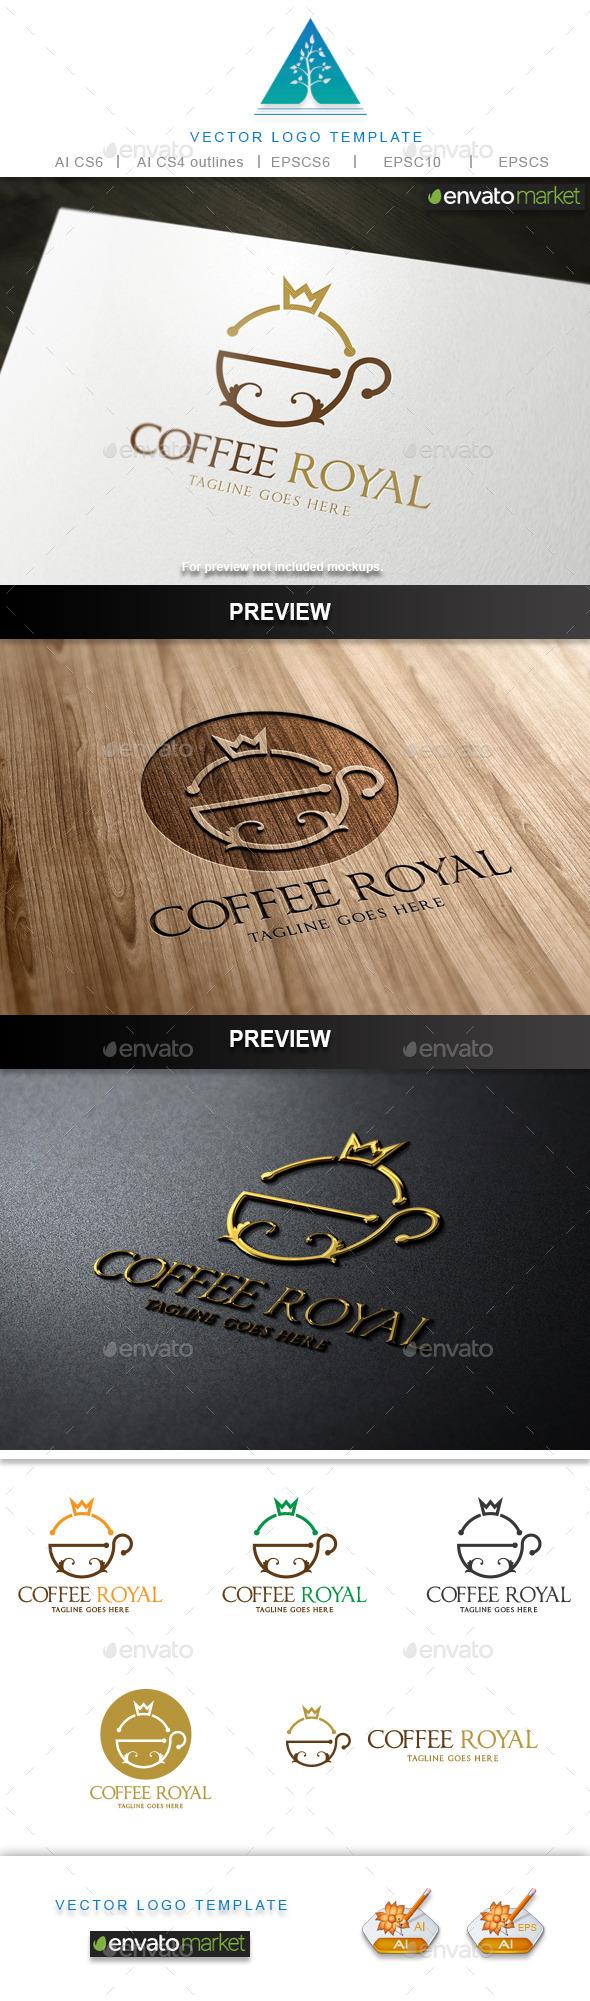 GraphicRiver Coffee Royal Logo 10345780